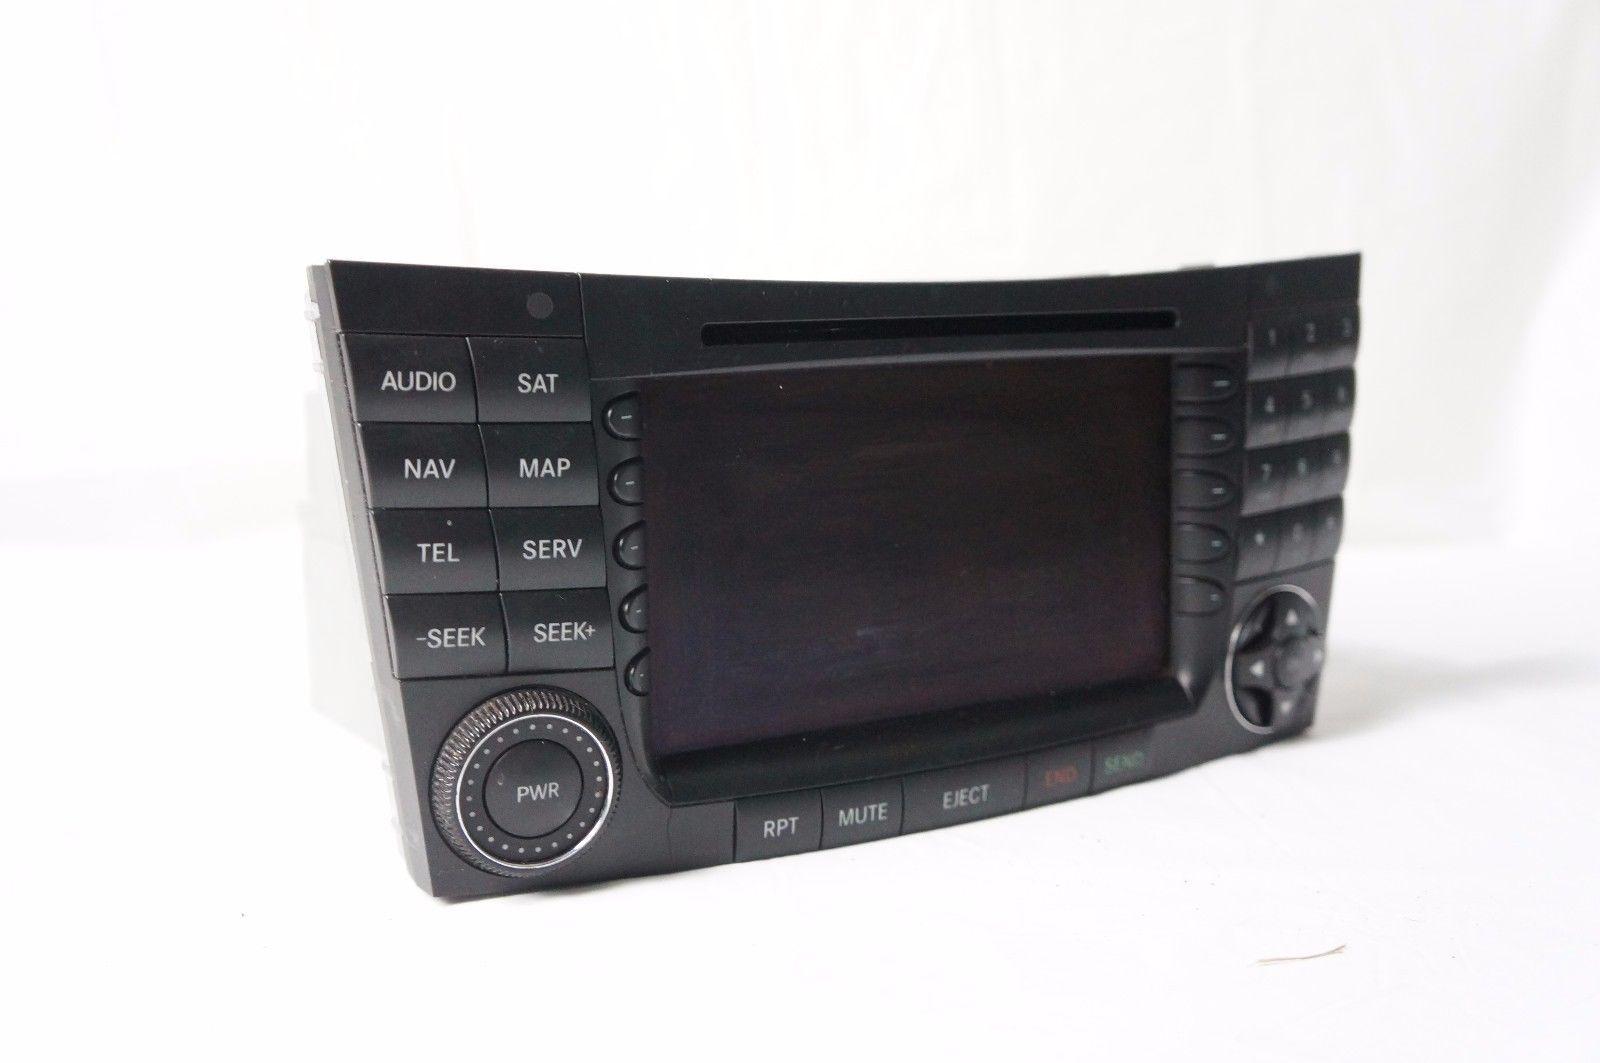 03 06 mercedes w211 e320 e350 e500 radio stereo gps. Black Bedroom Furniture Sets. Home Design Ideas